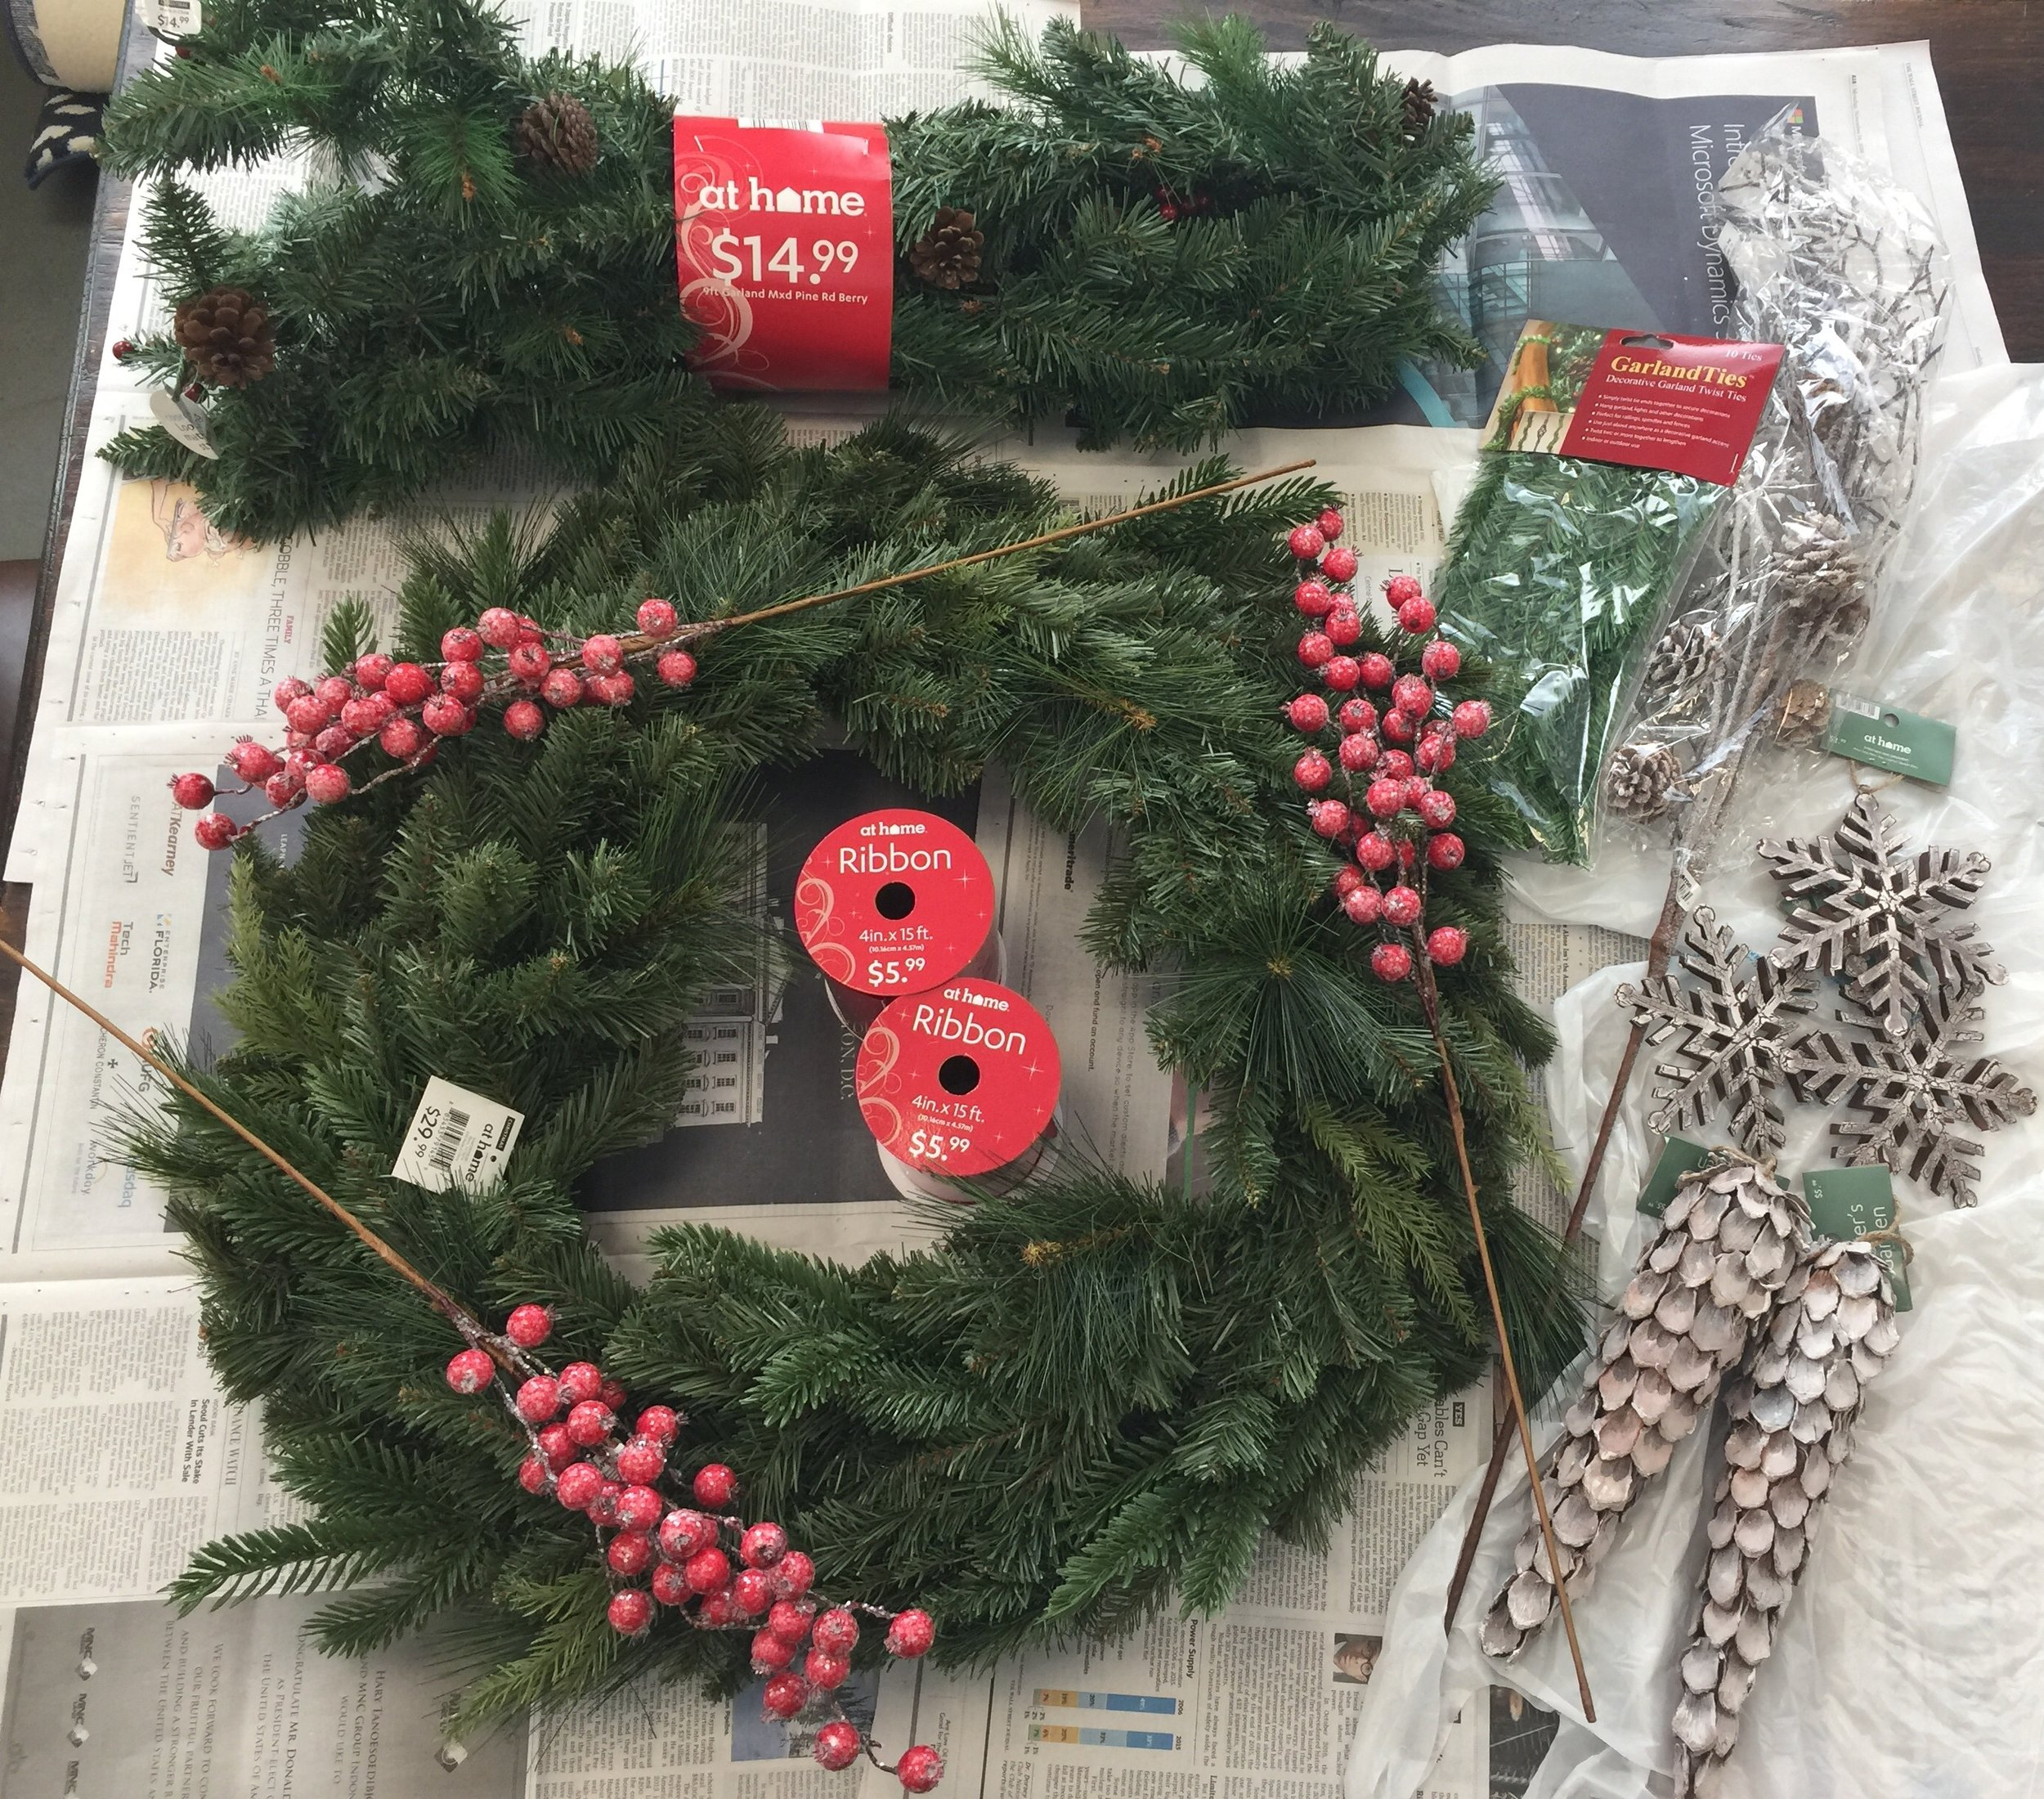 DIY Woodland Christmas Wreath - Supplies